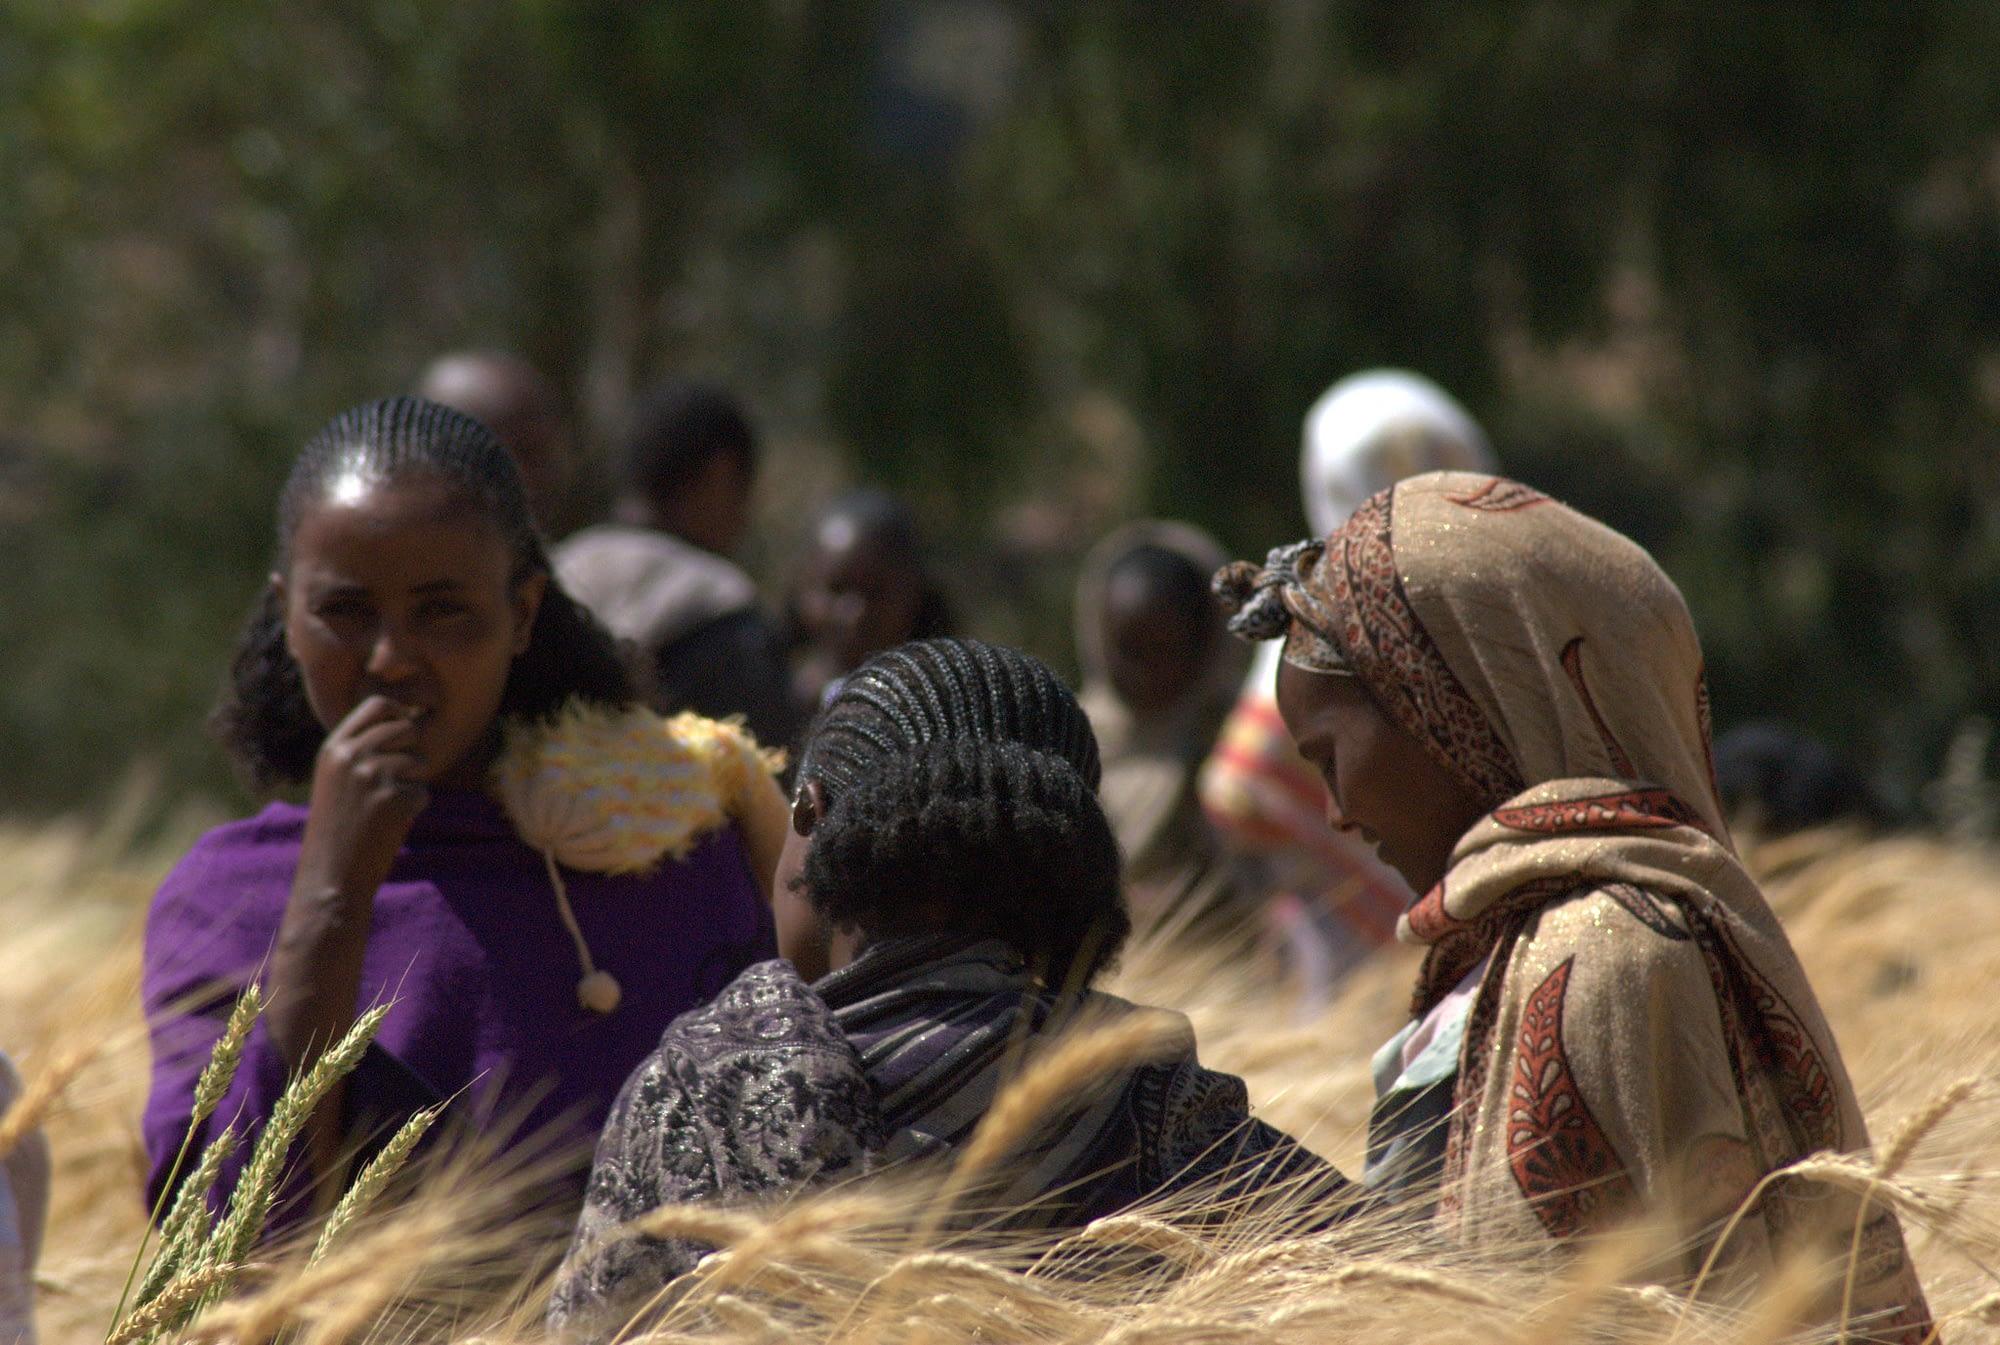 Farmers evaluate traits of wheat varieties, Ethiopia. (Photo: Jeske van de Gevel/Bioversity International)